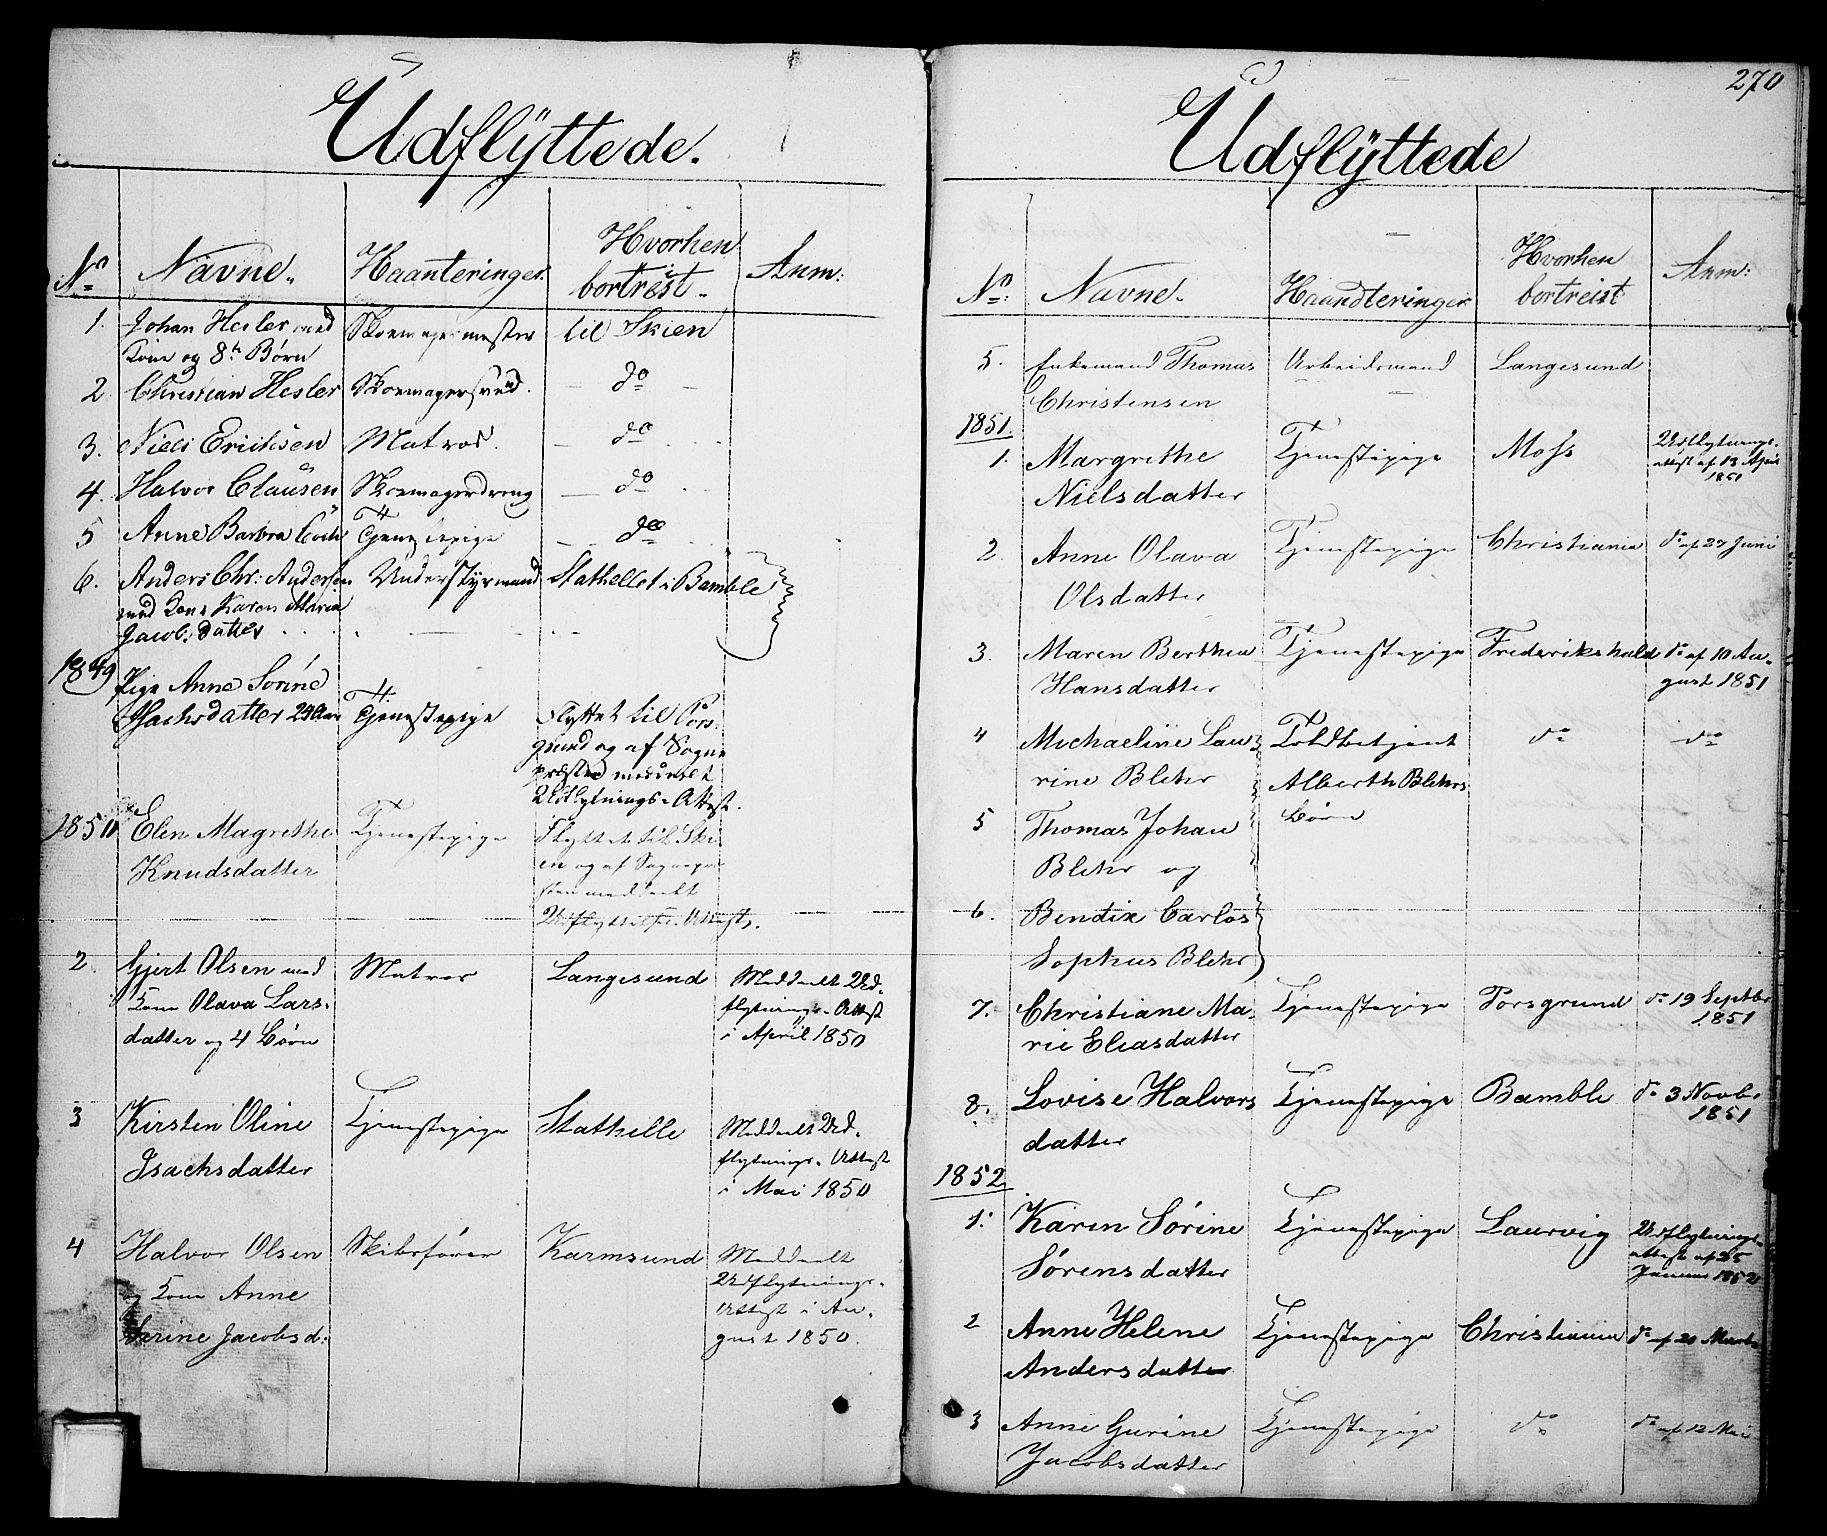 SAKO, Brevik kirkebøker, G/Ga/L0002: Klokkerbok nr. 2, 1846-1865, s. 270